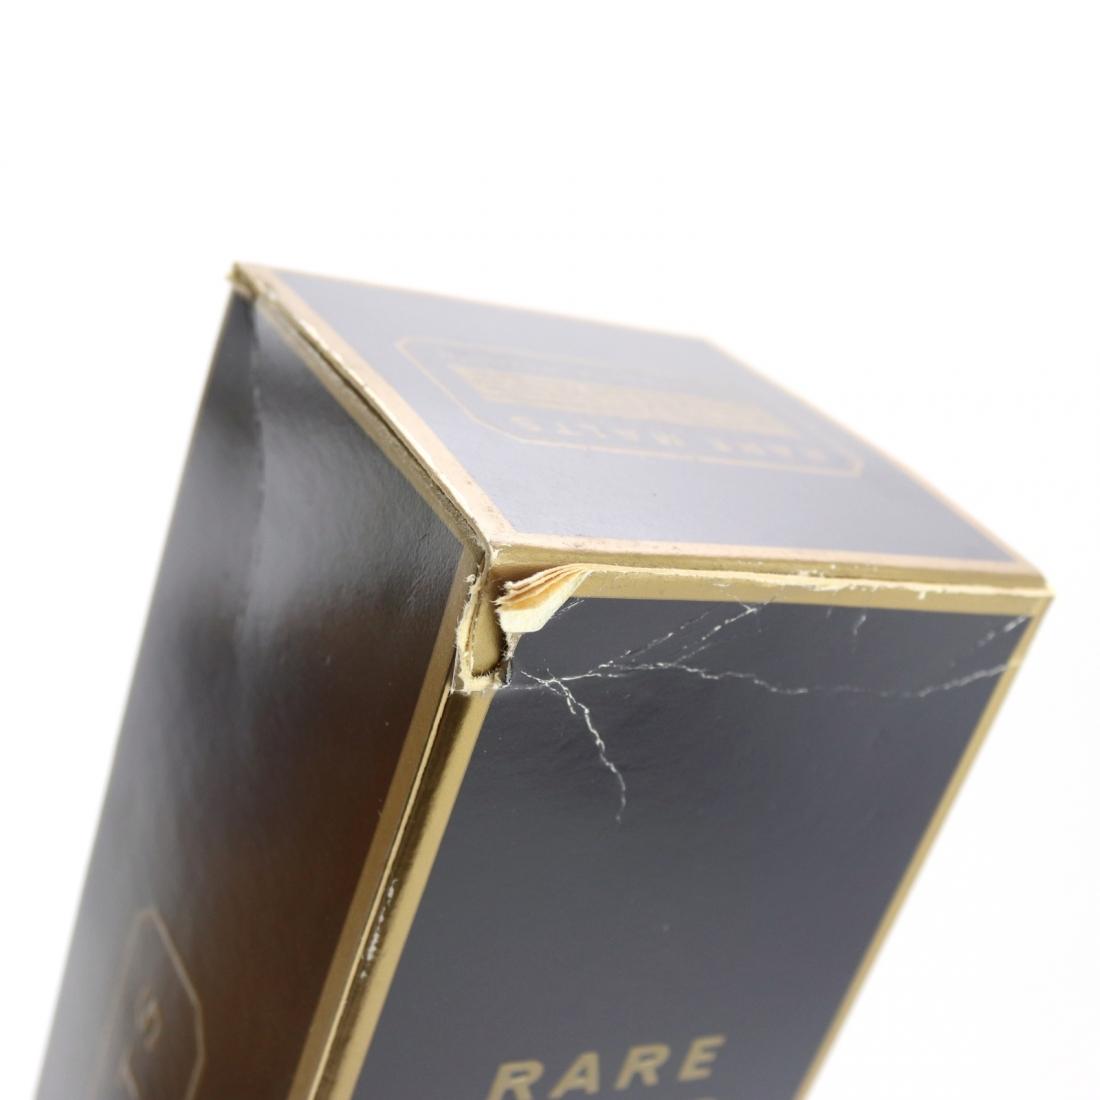 Linkwood 1974 Rare Malt 23 Year Old 75cl / 61.2%